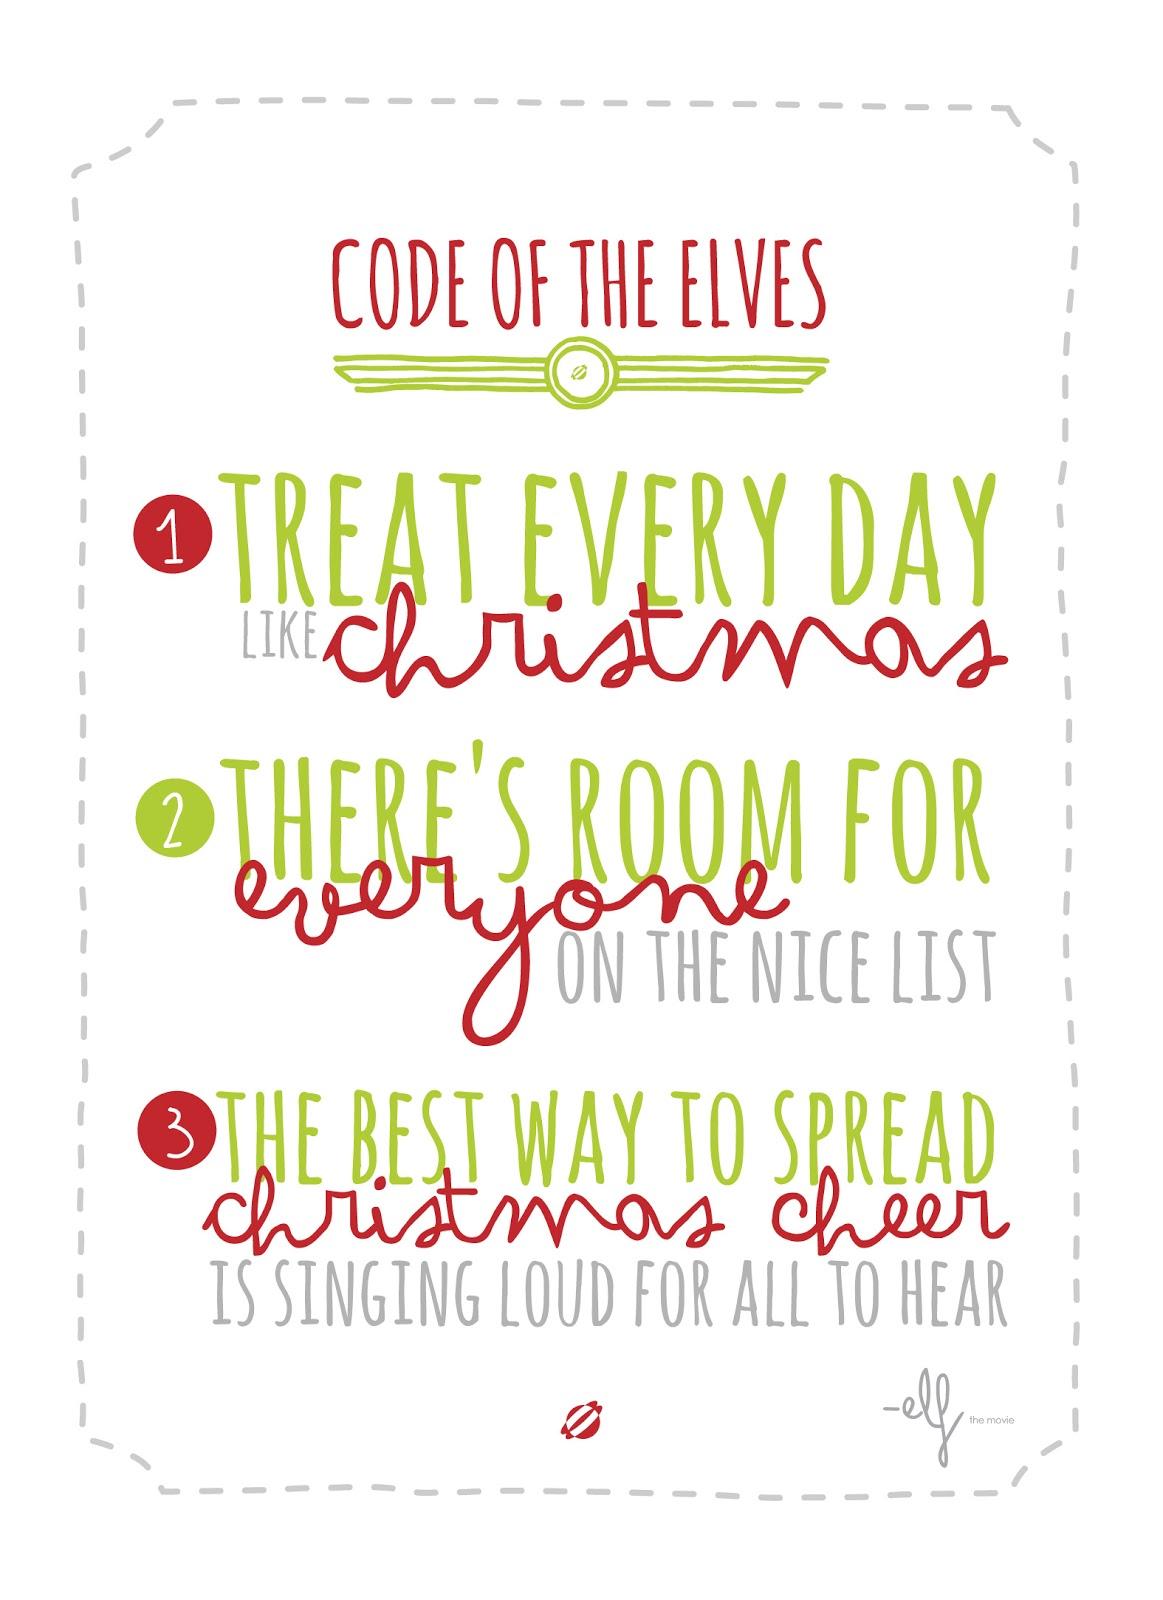 graphic regarding Elf Yourself Printable referred to as LostBumblebee: Code Of The Elves- Elf Your self.